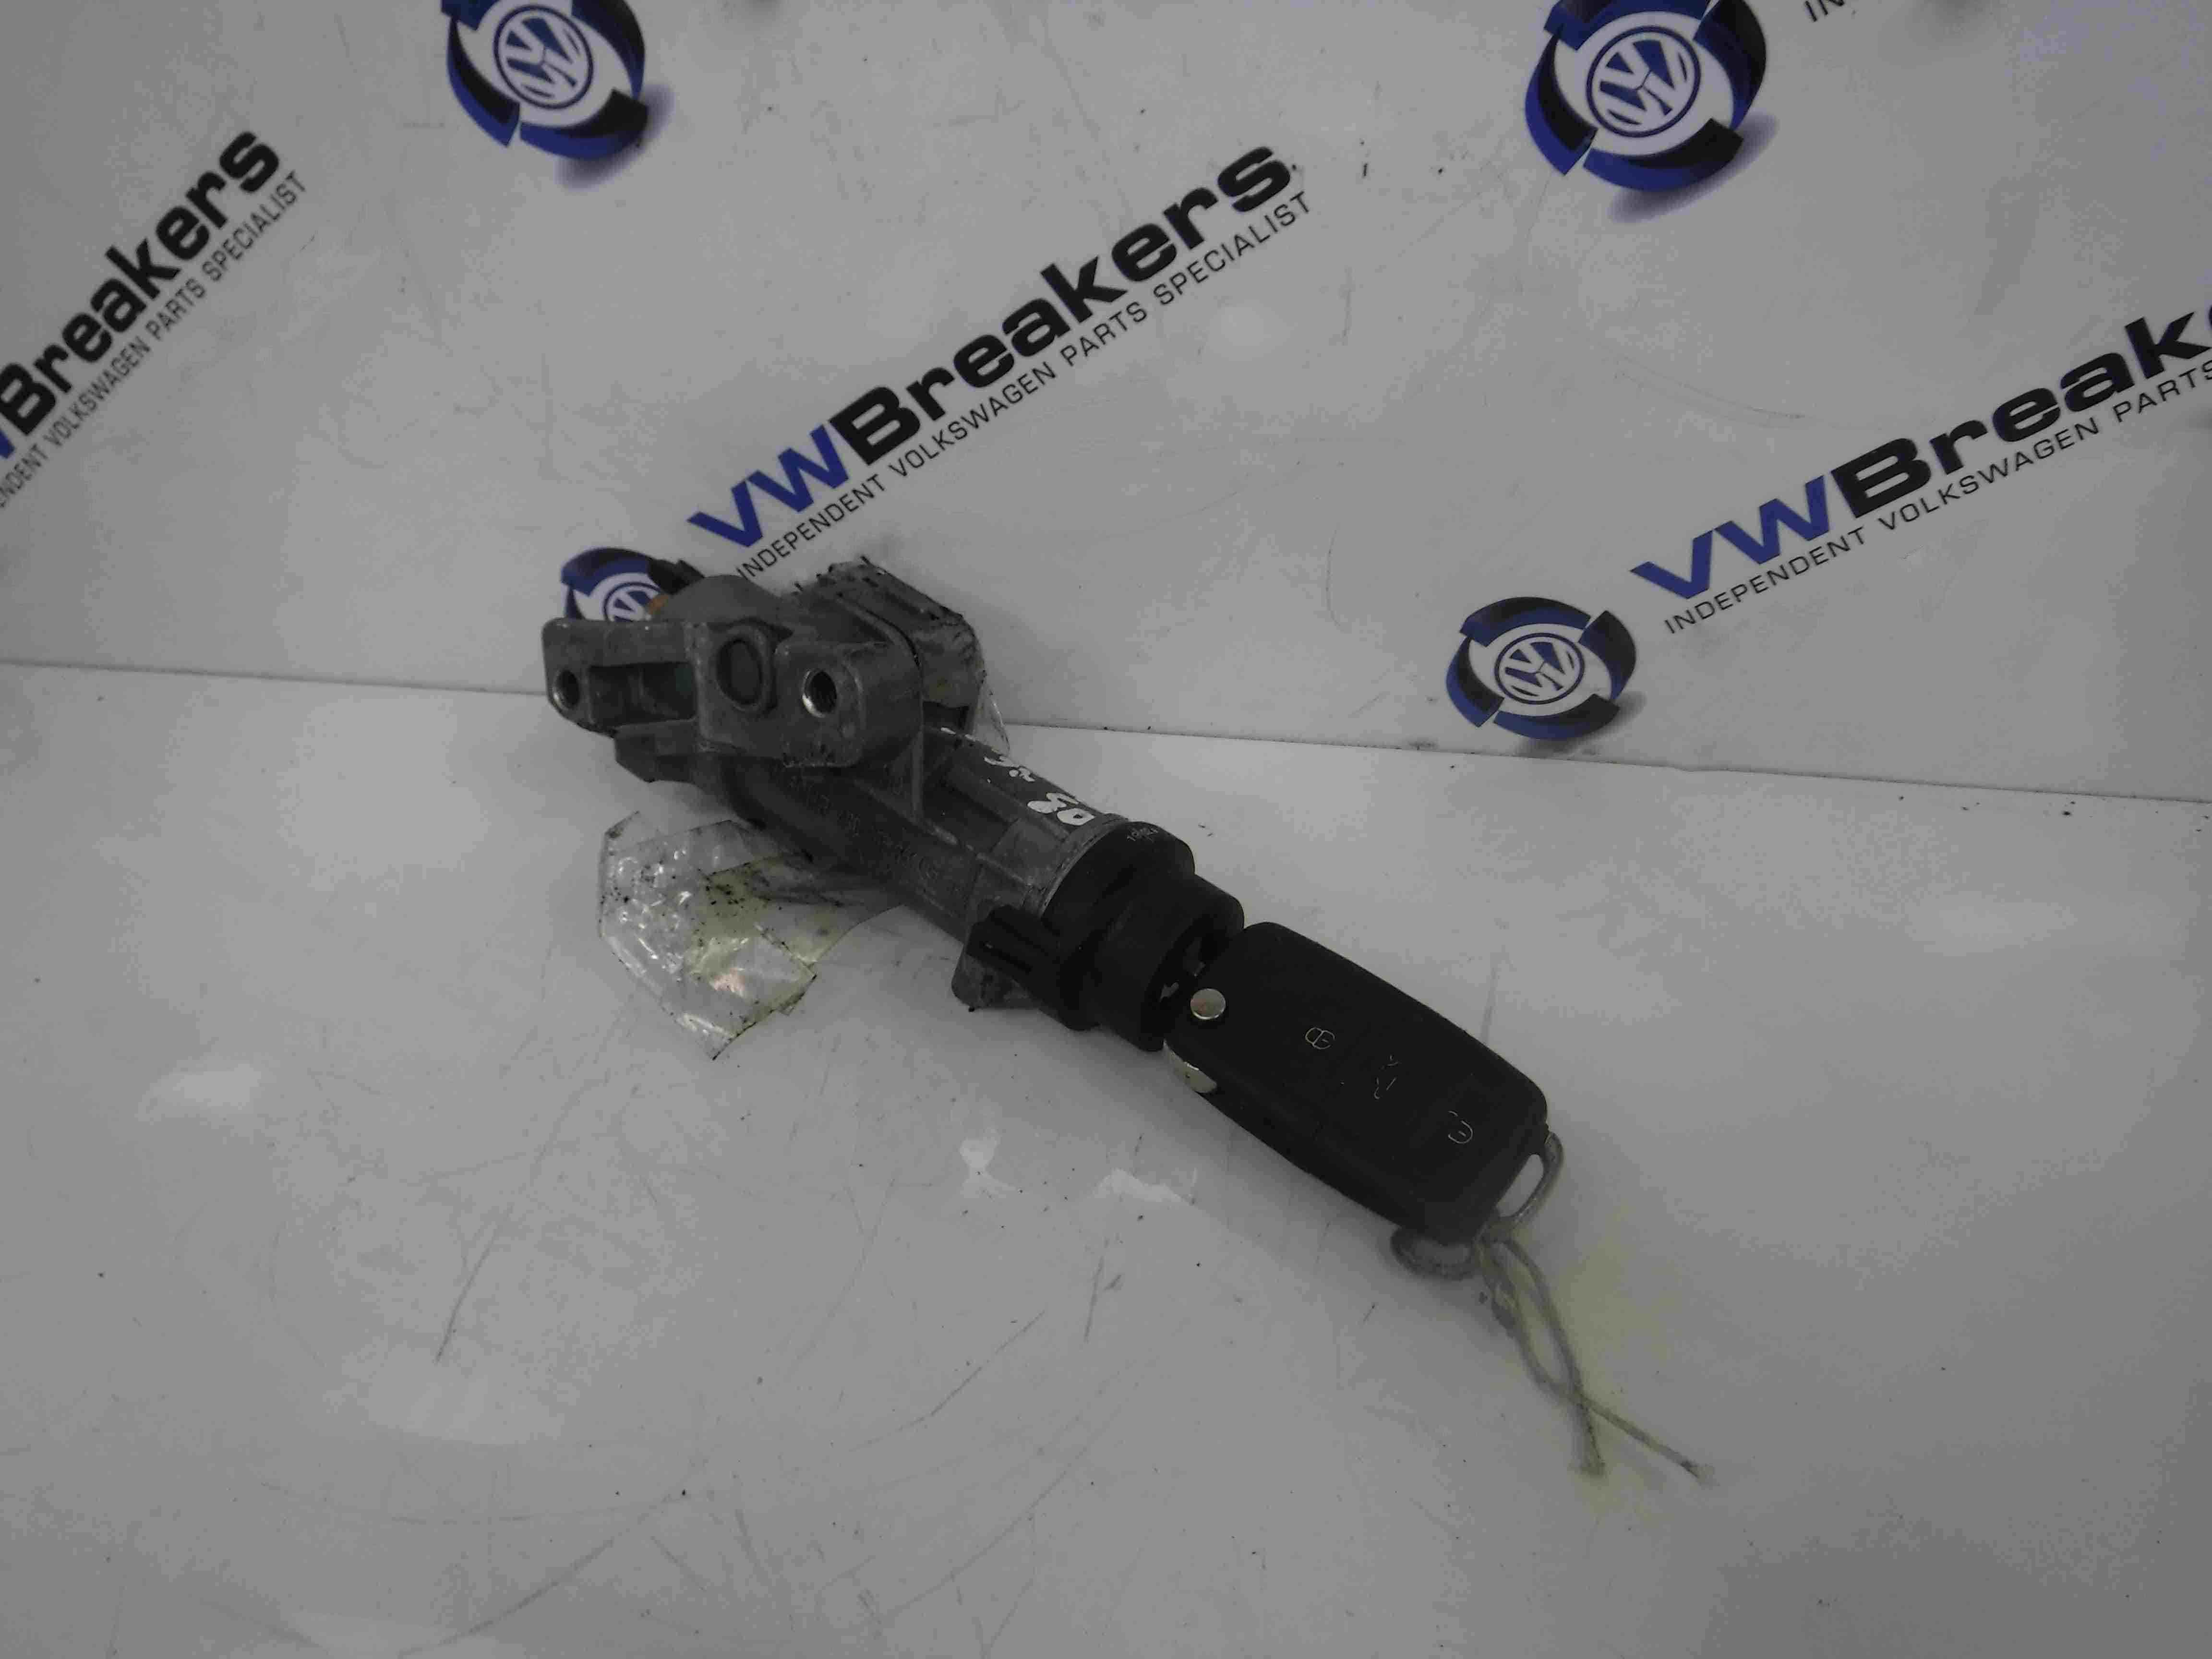 Volkswagen Beetle + Convertible 1999-2006 Ignition Barrel + Key 4B0905851G